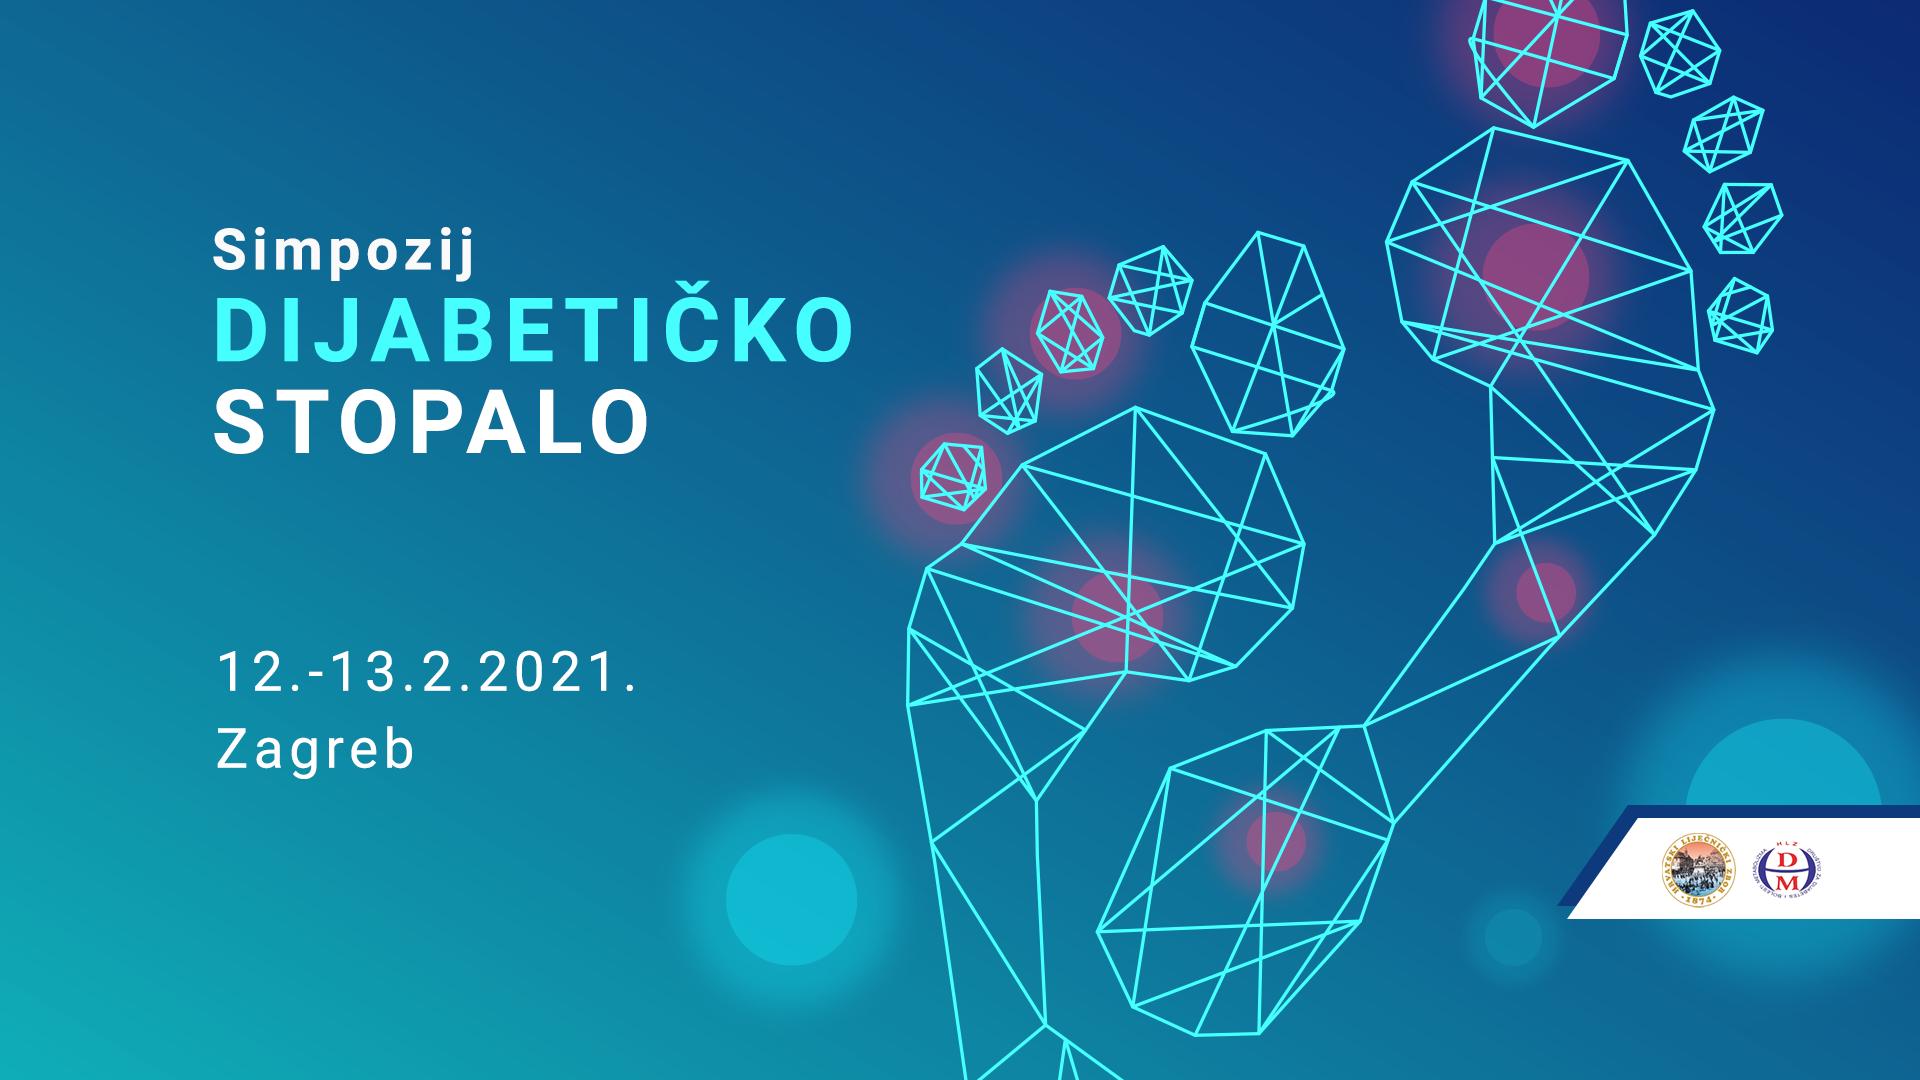 Poslijediplomski tečaj 1. kategorije Dijabetičko stopalo, Zagreb 12.-13.2.2021.